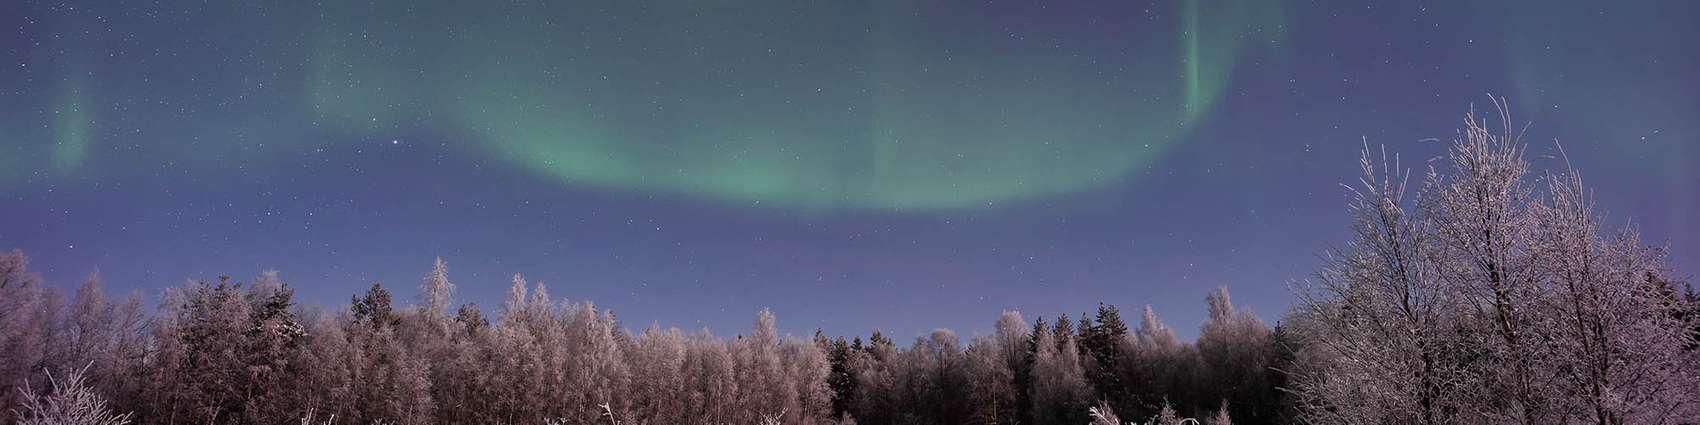 nordlys i finland